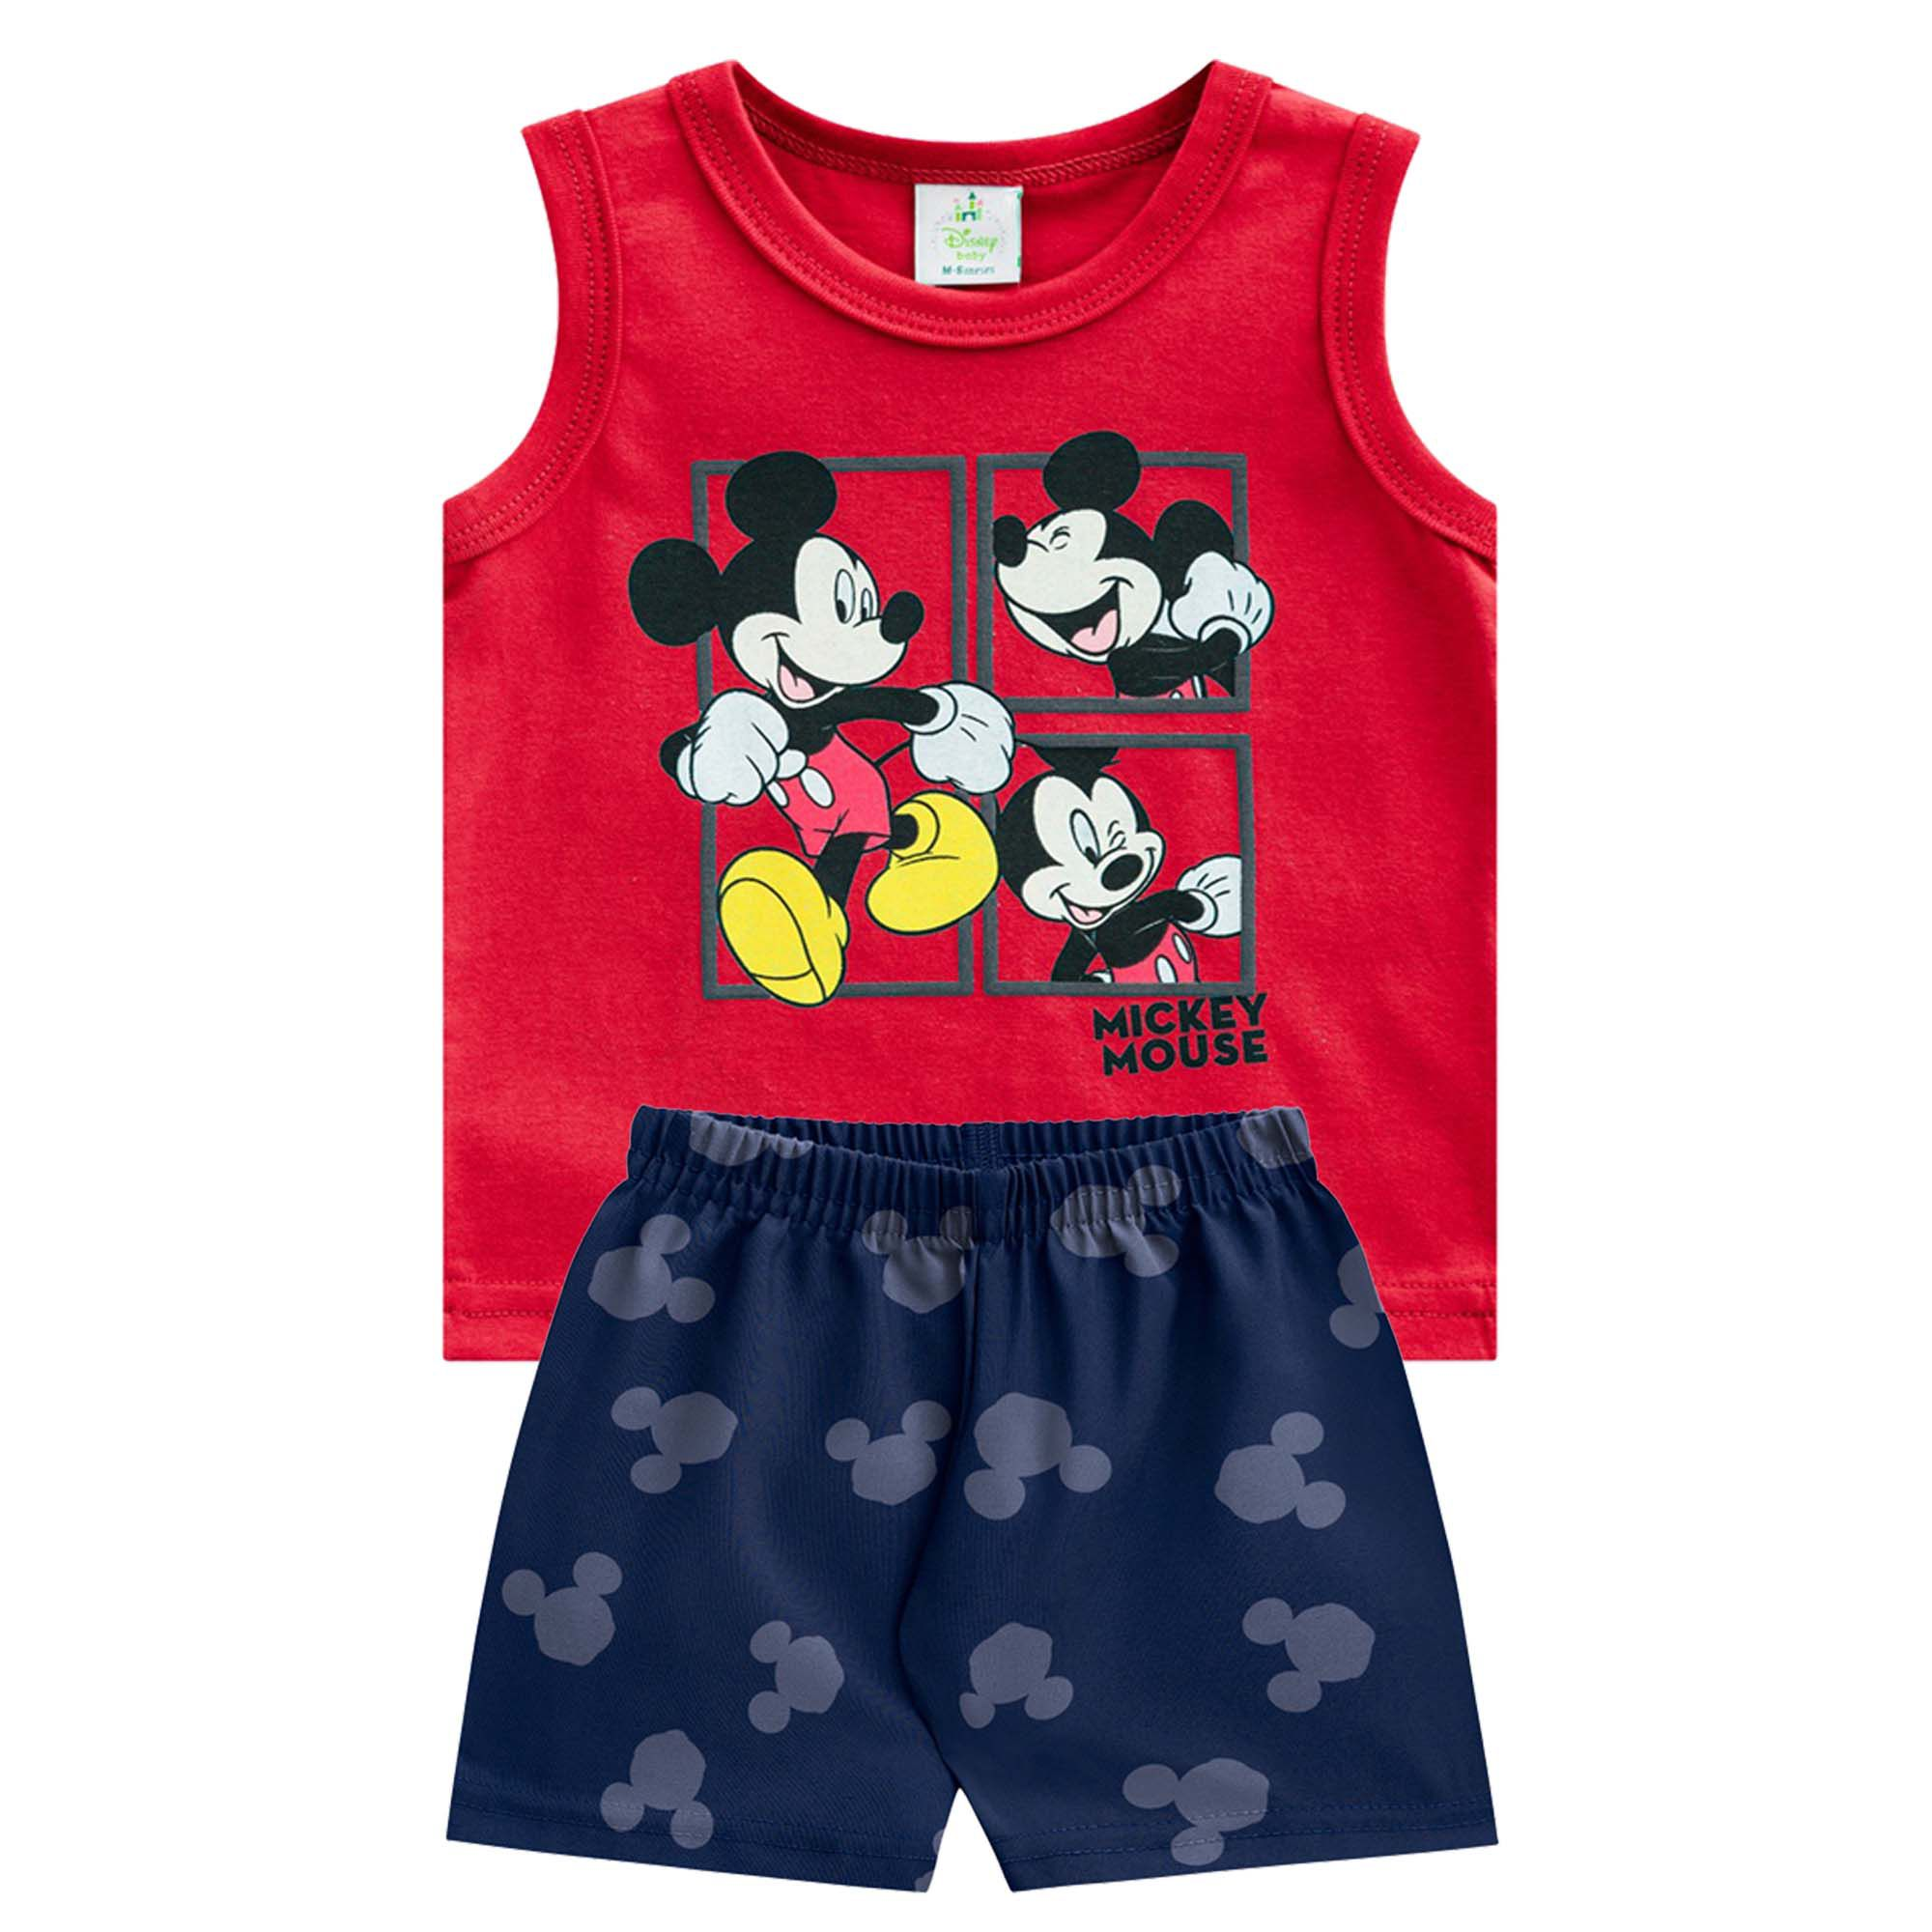 Conjunto Verão Brandili Regata Mickey Mouse com Bermuda Microfibra - P ao G